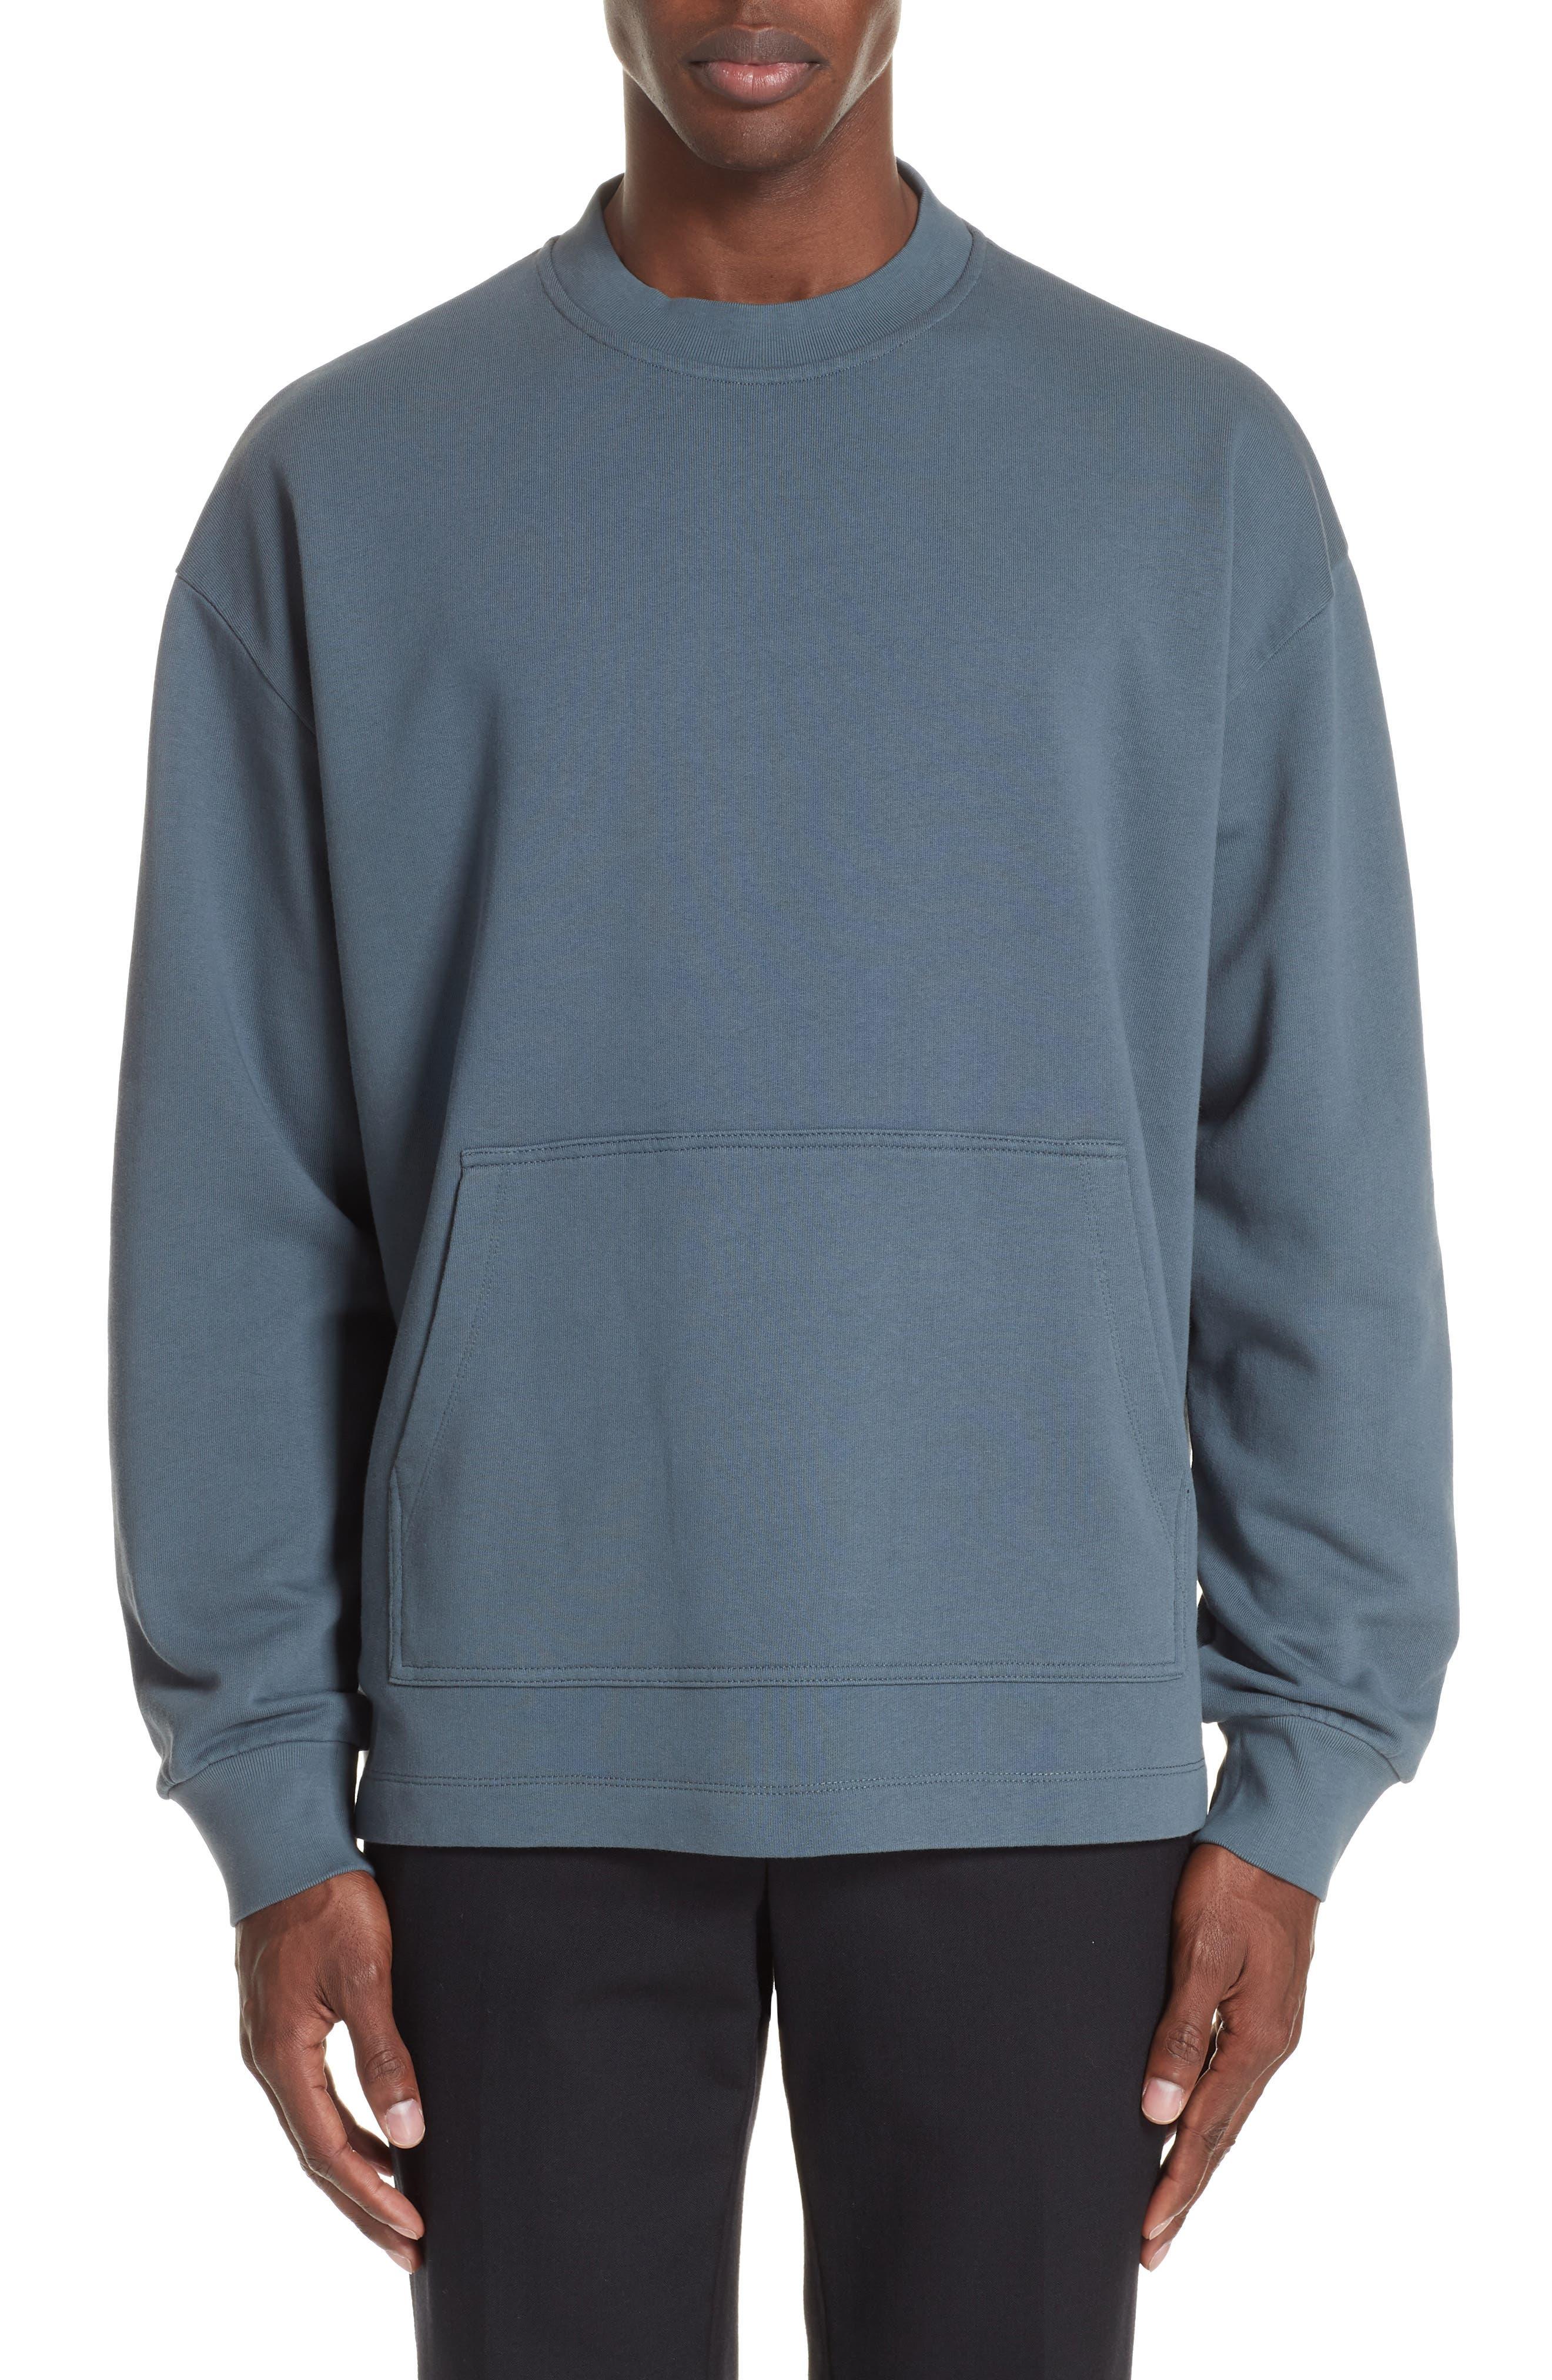 Fleece Knit Sweatshirt,                             Main thumbnail 1, color,                             GREY